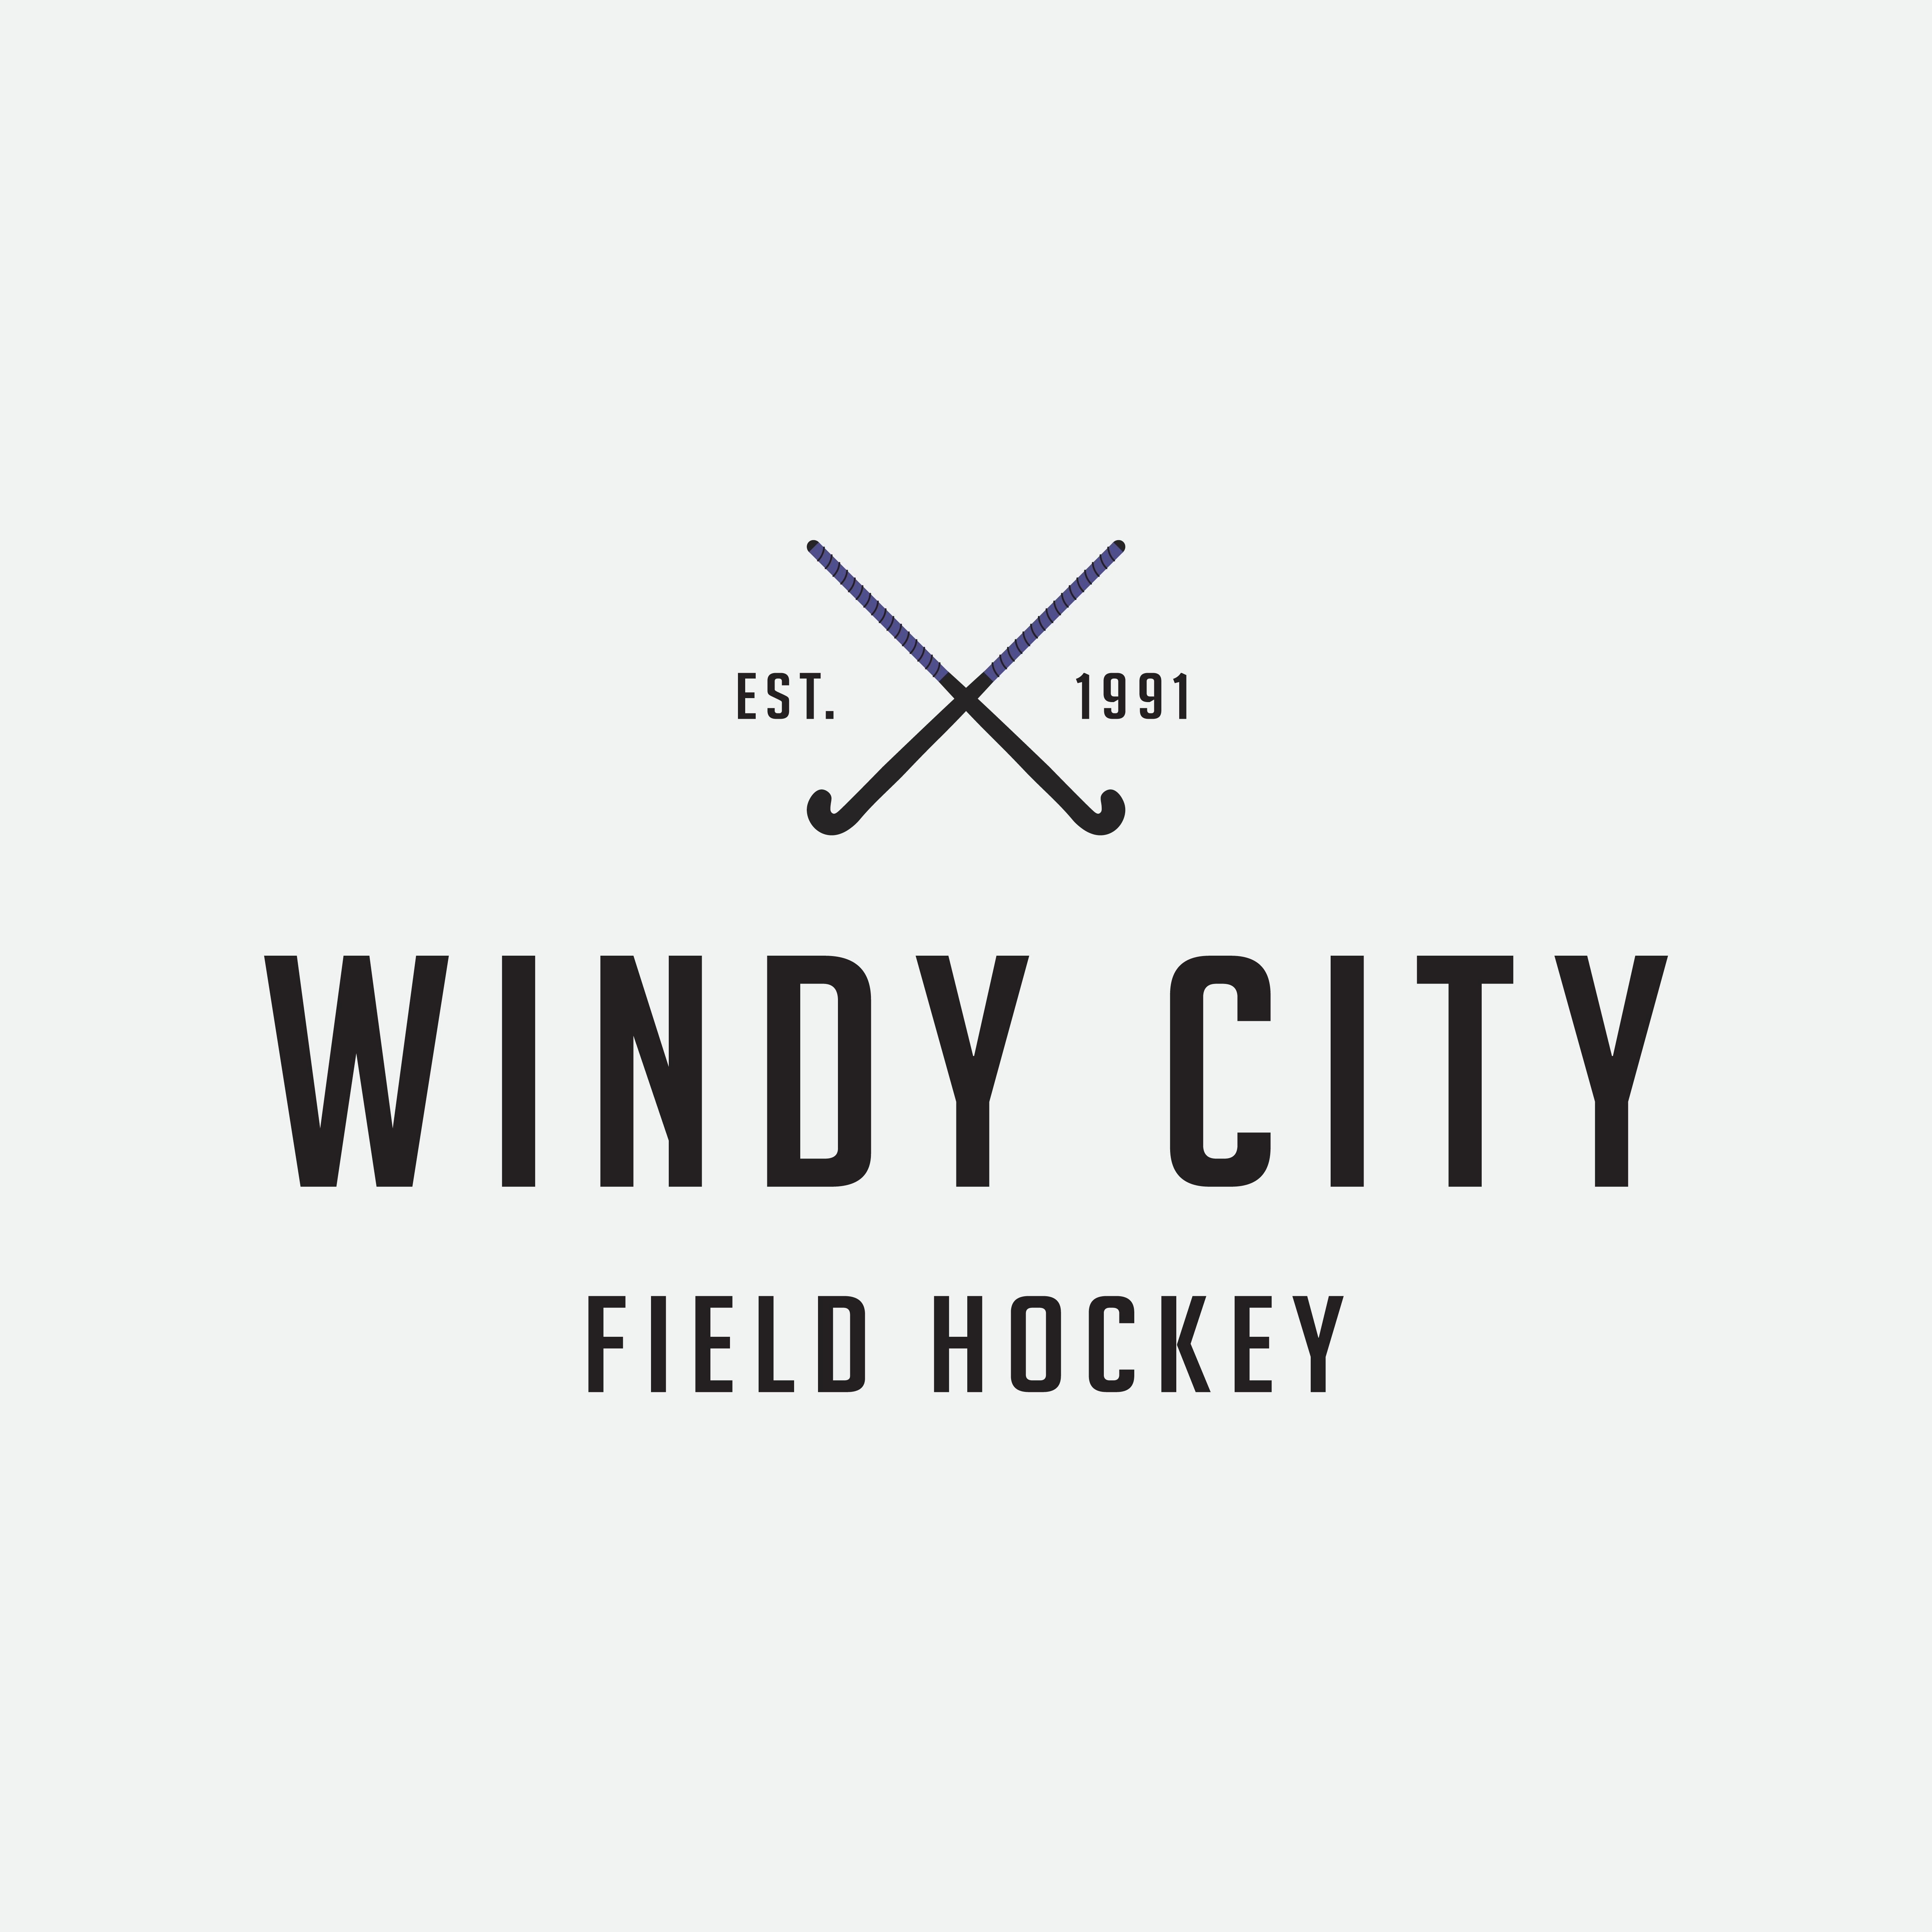 Windy City Field Hockey Logo Designed By Amari Creative Windycity Fieldhockey Amari Am Creative Branding Branding Design Studio Creative Branding Design